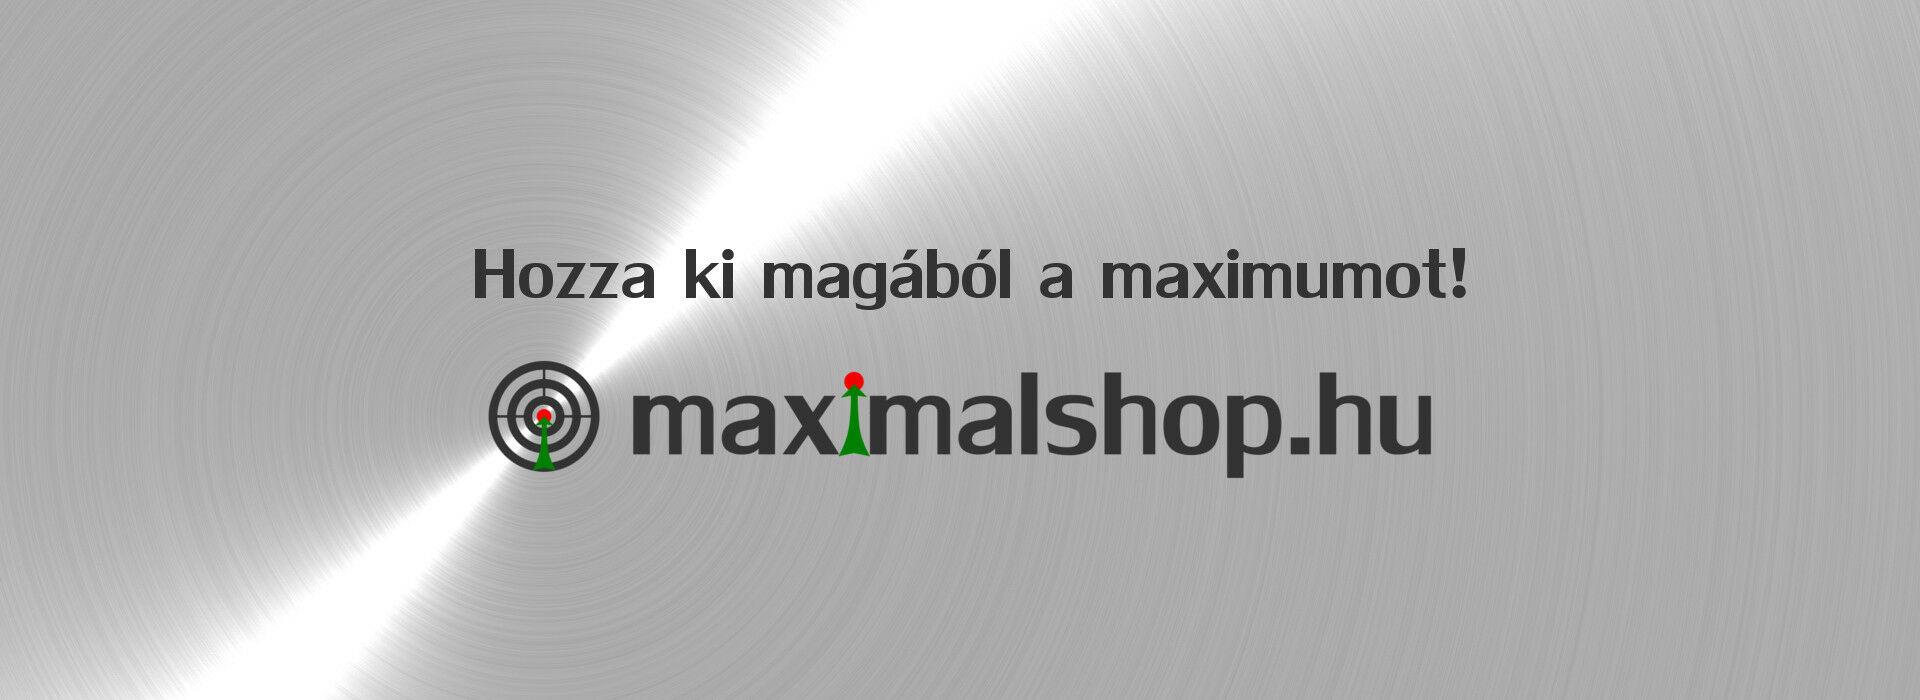 maximalshop1